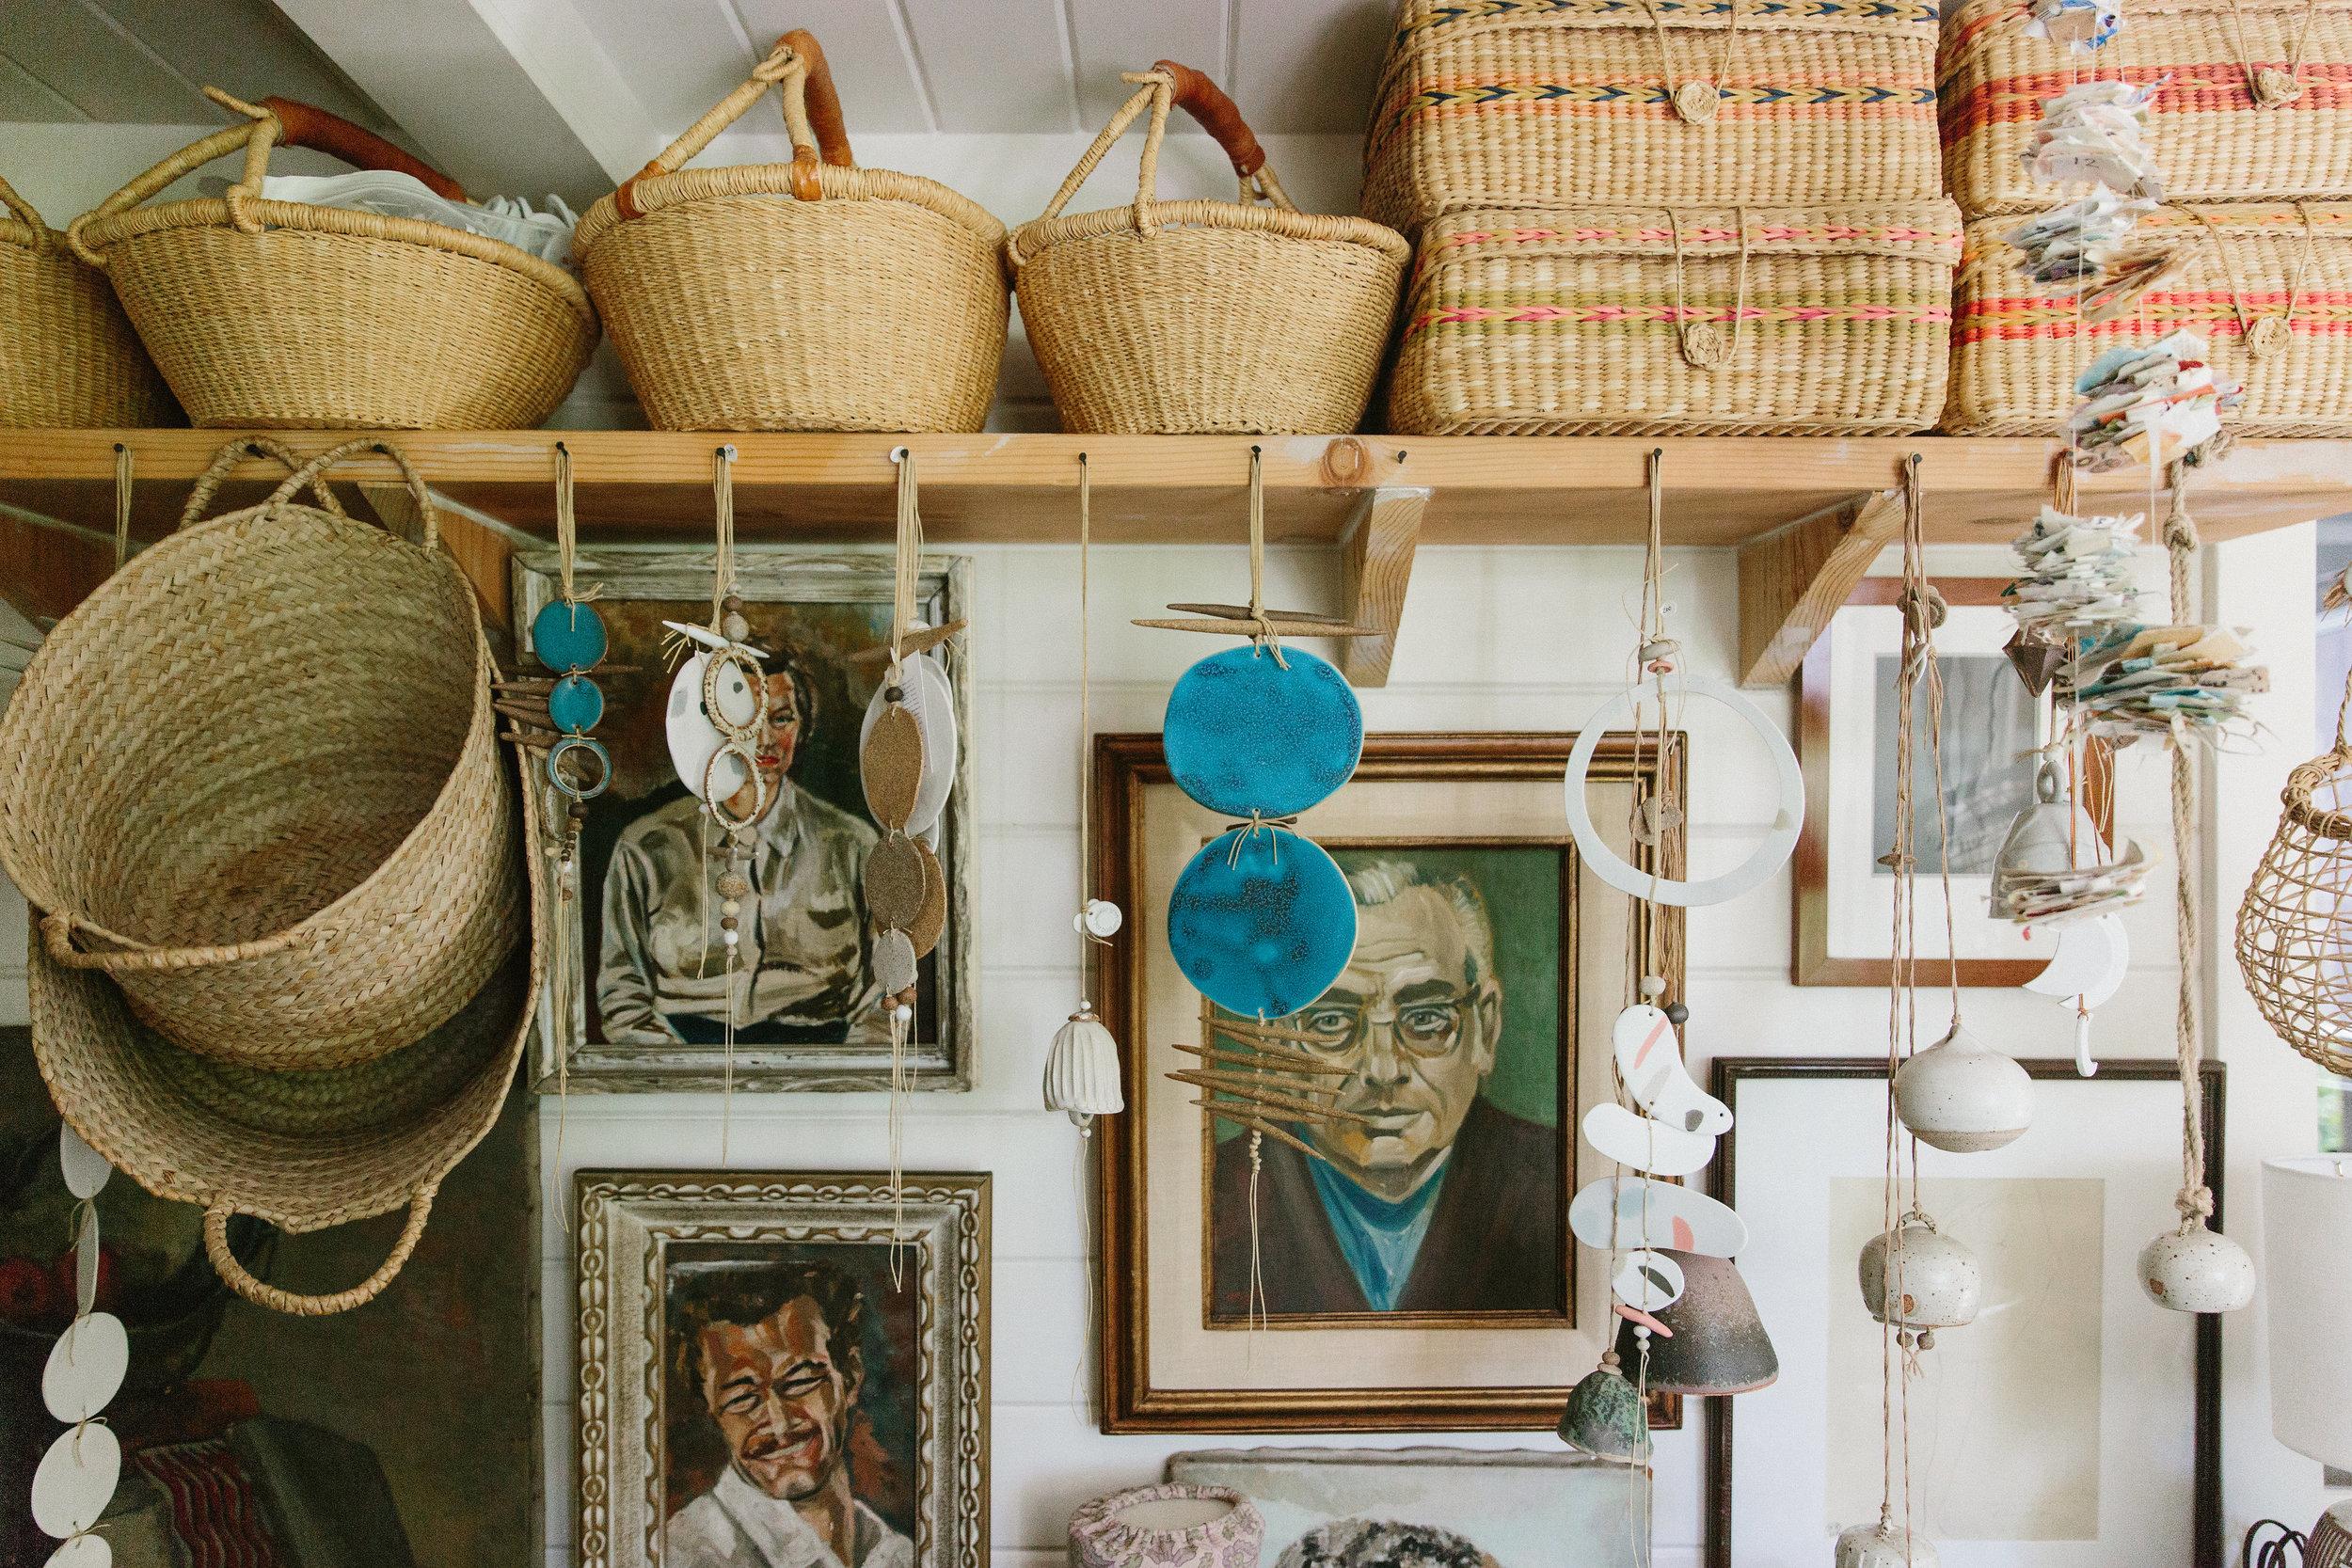 mt-washington-pottery_jenni-kayne_nicki-sebastian-photography-21.jpg